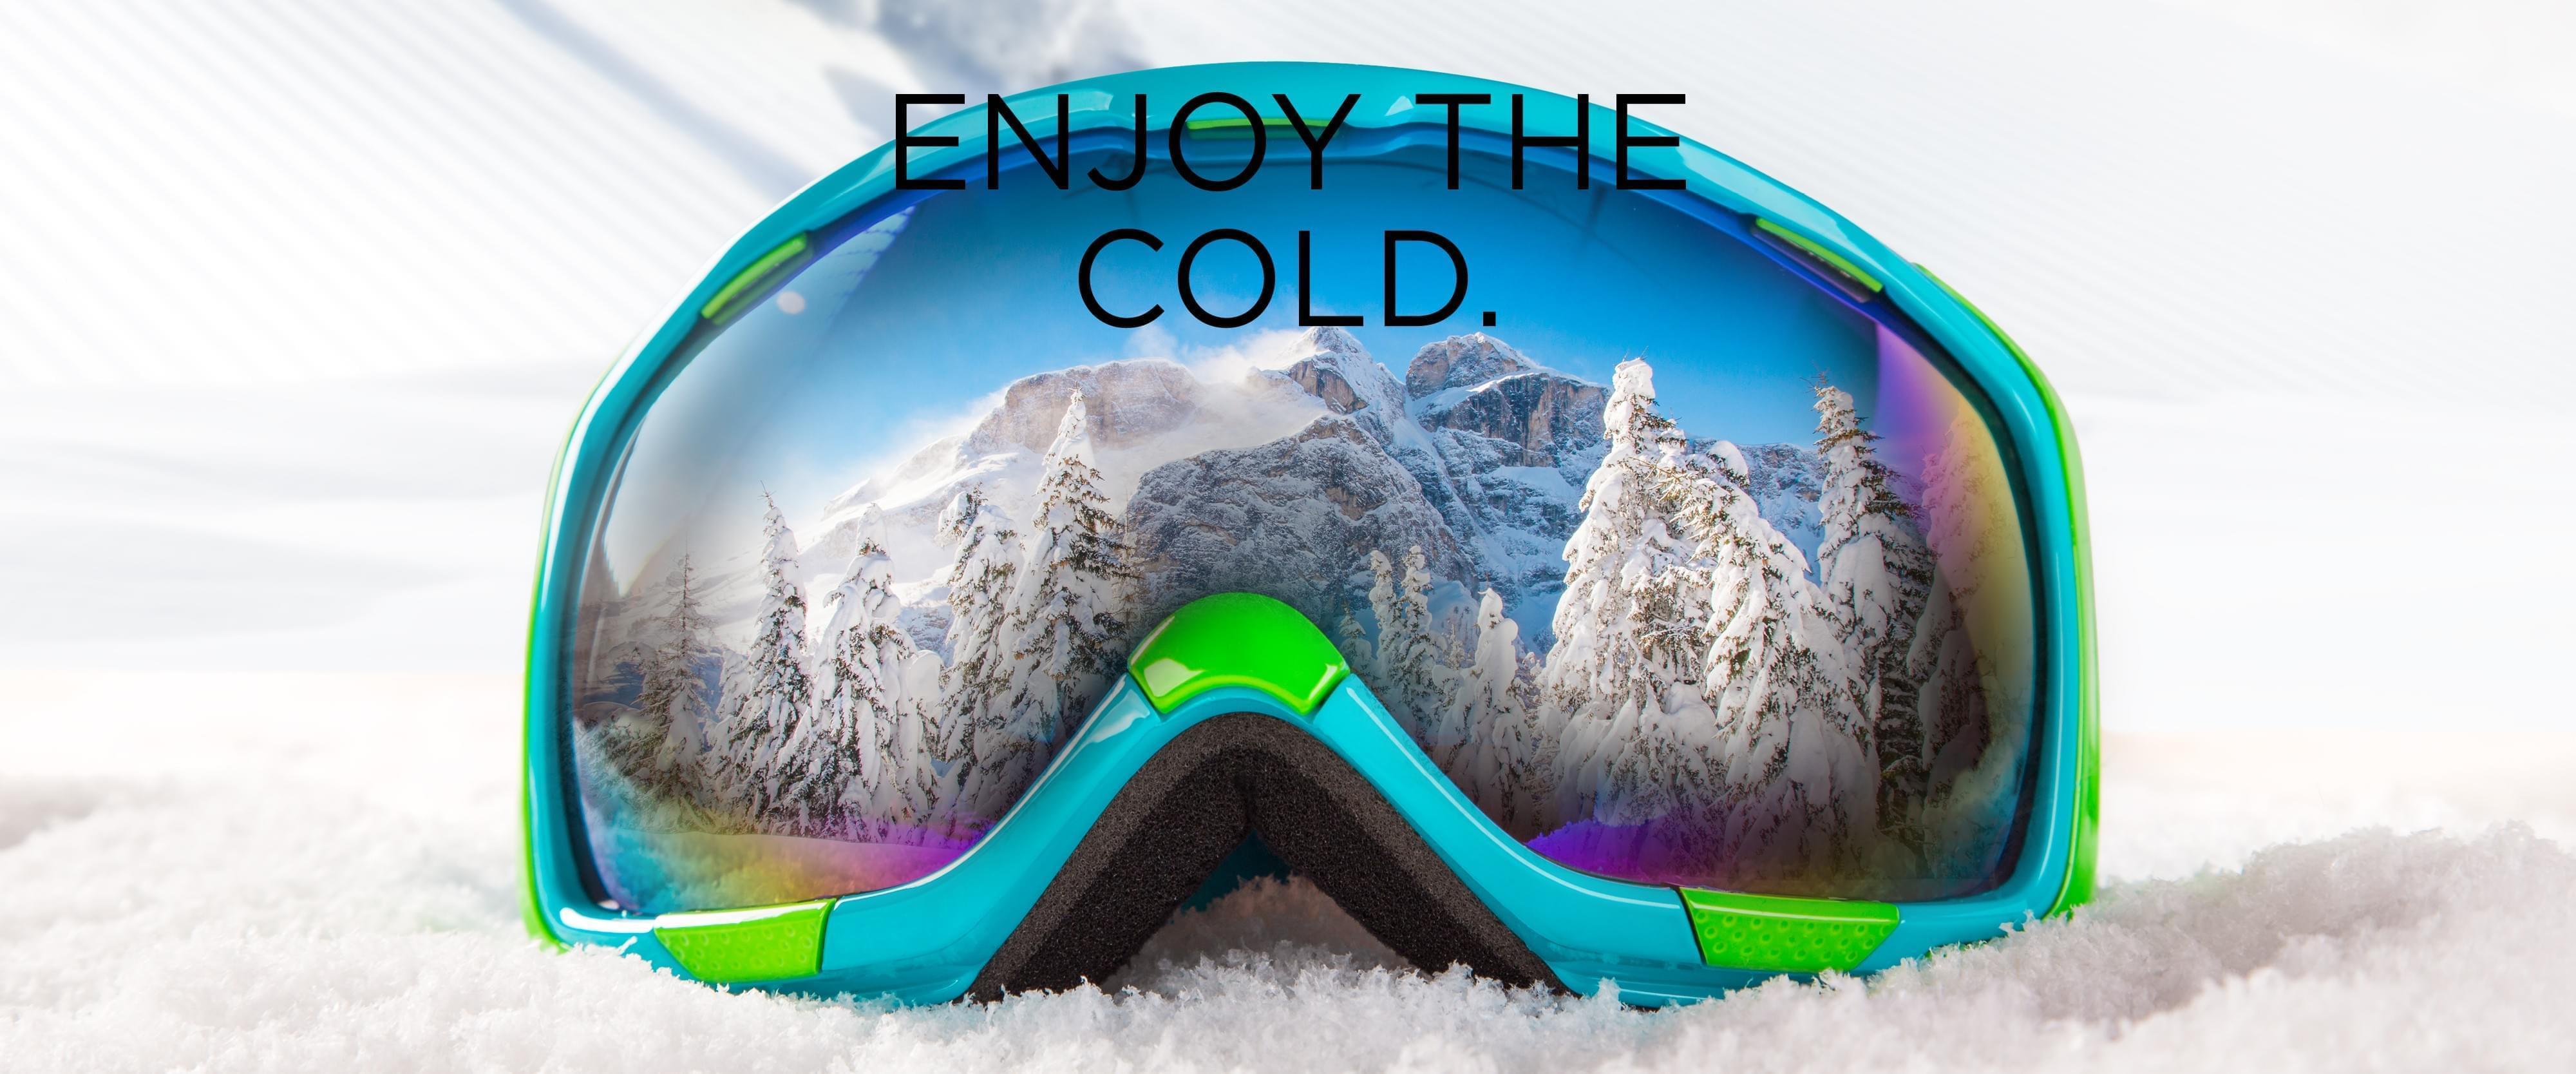 Scopri le nostre offerte di accessori sci